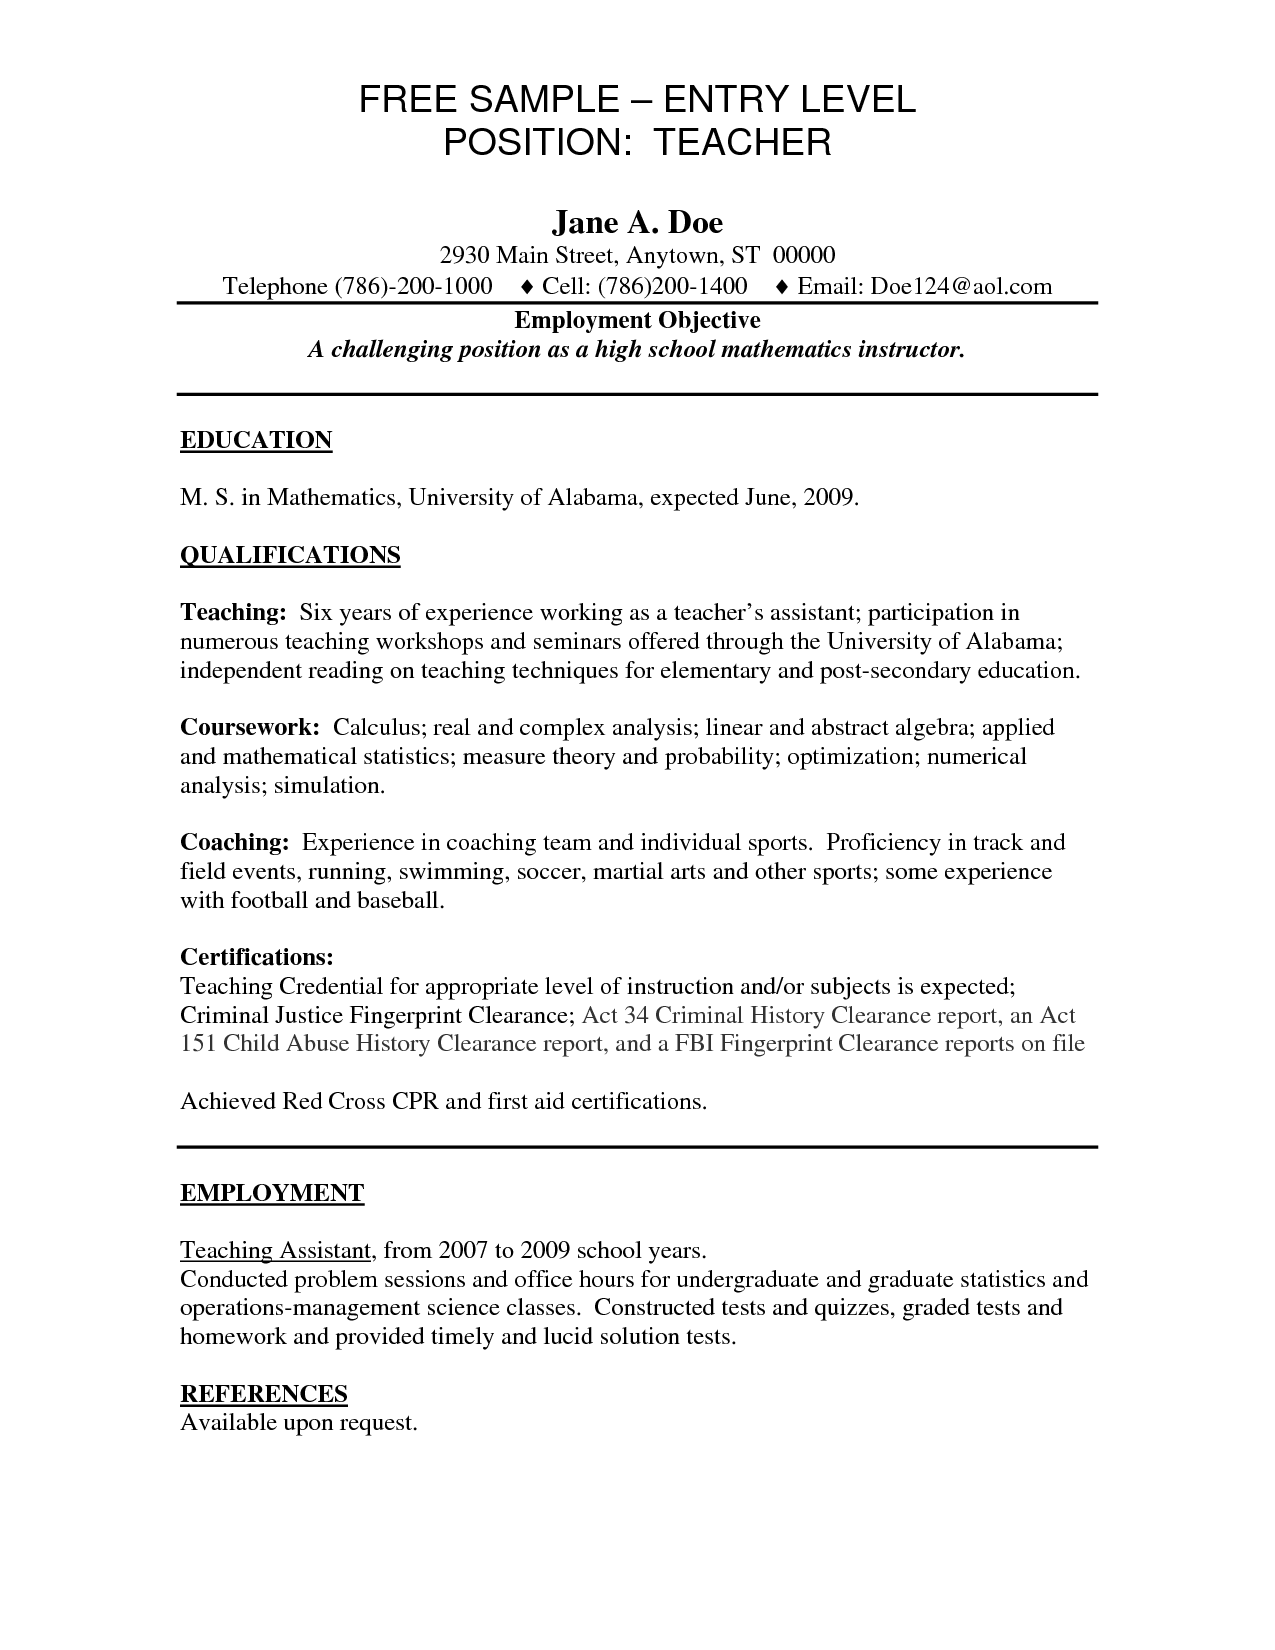 Entry Level It Job Resume Resume Ideas | Best Resume ...